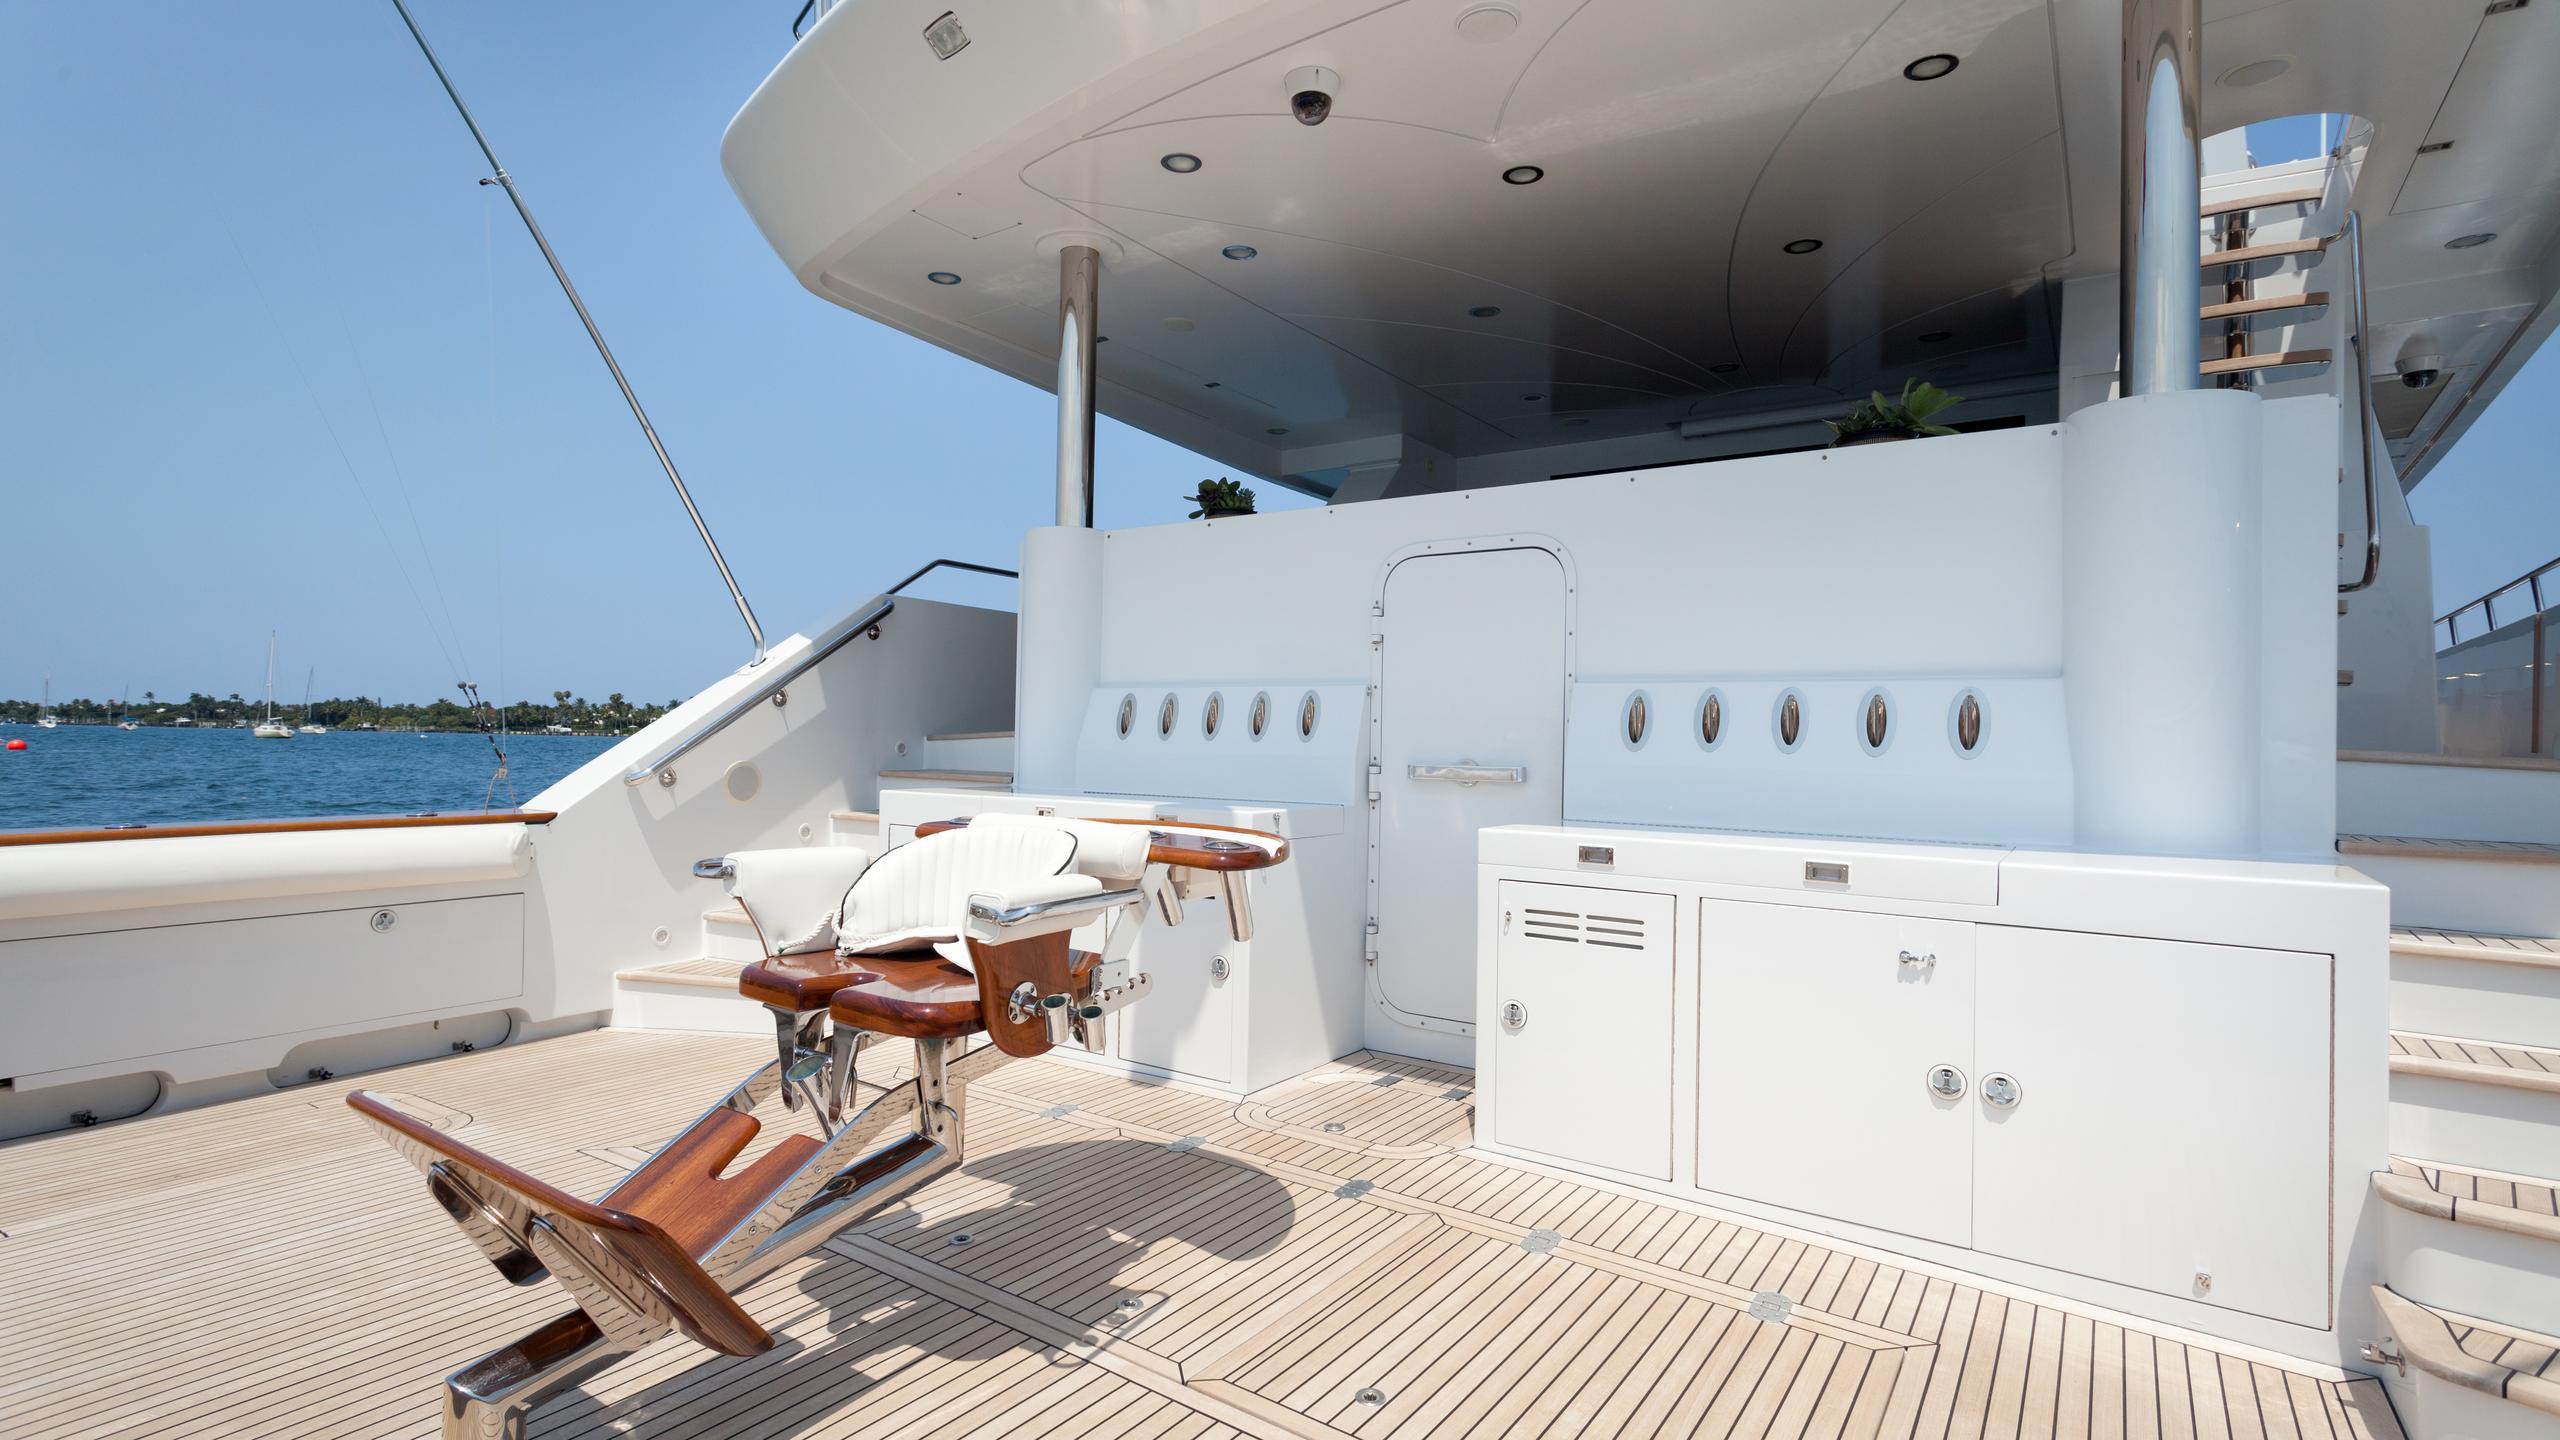 valkyrie-yacht